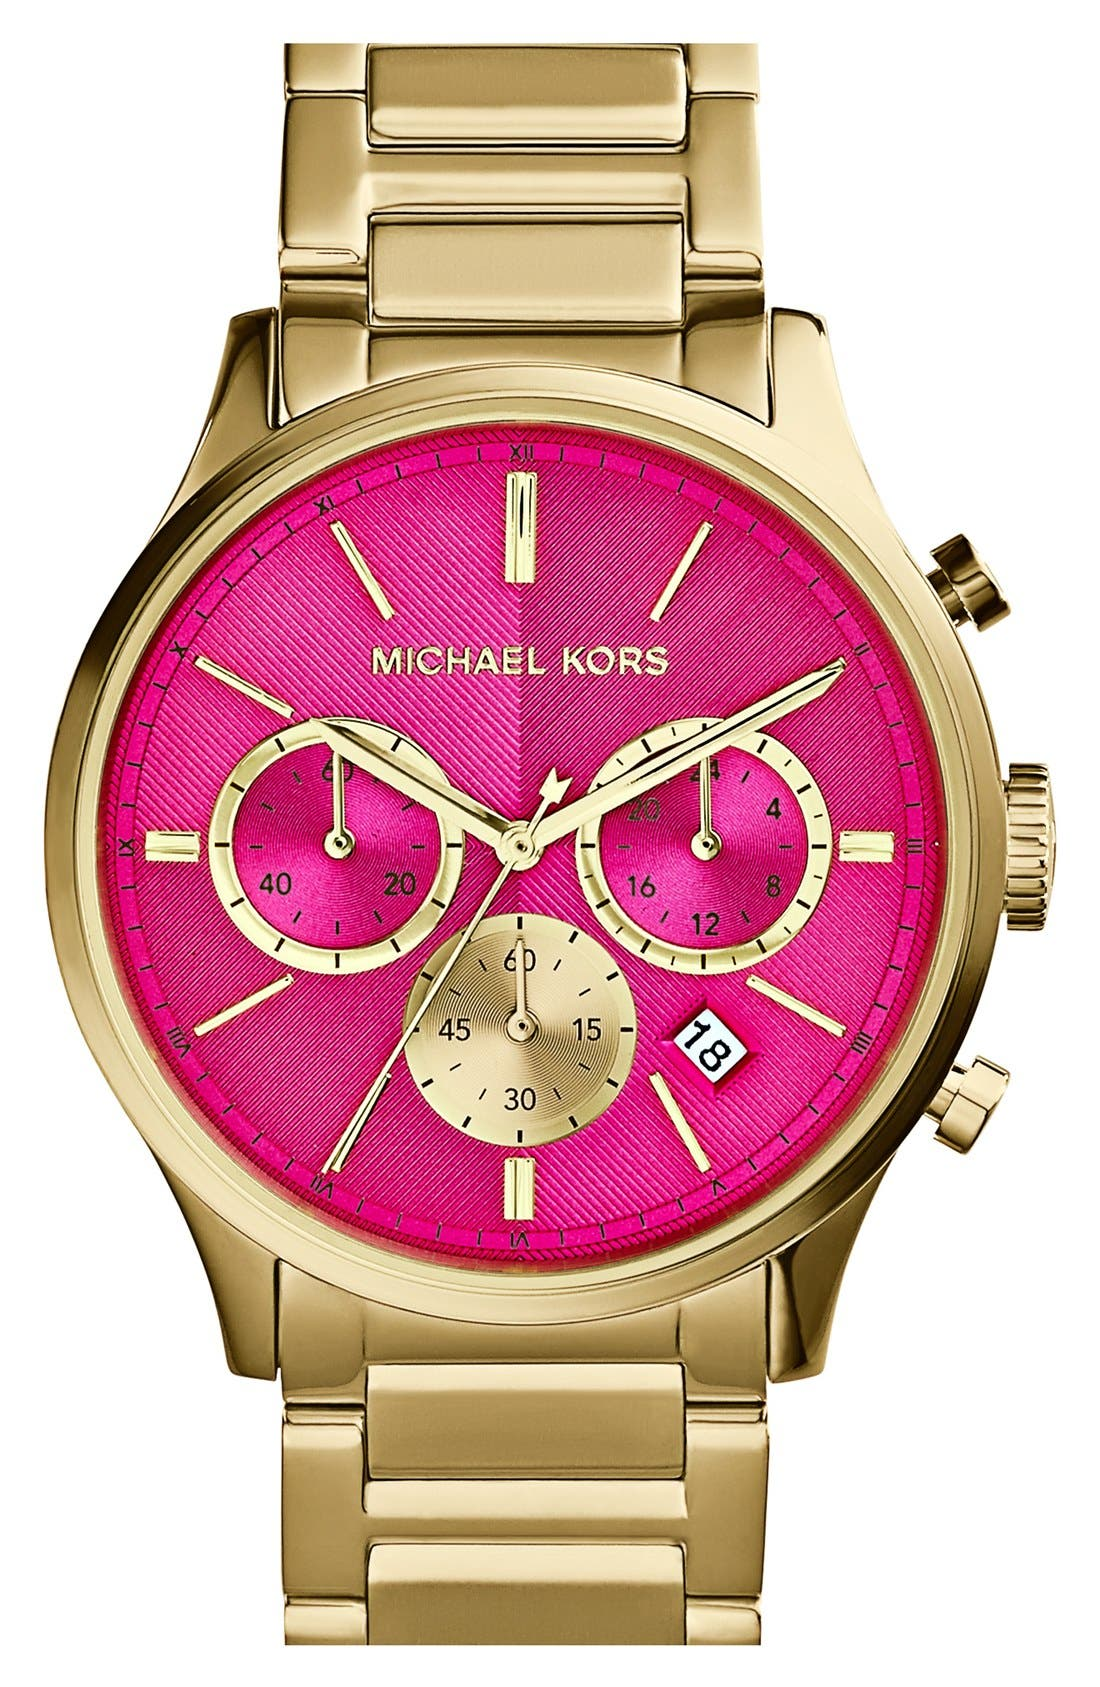 Main Image - Michael Kors 'Bailey' Chronograph Bracelet Watch, 44mm